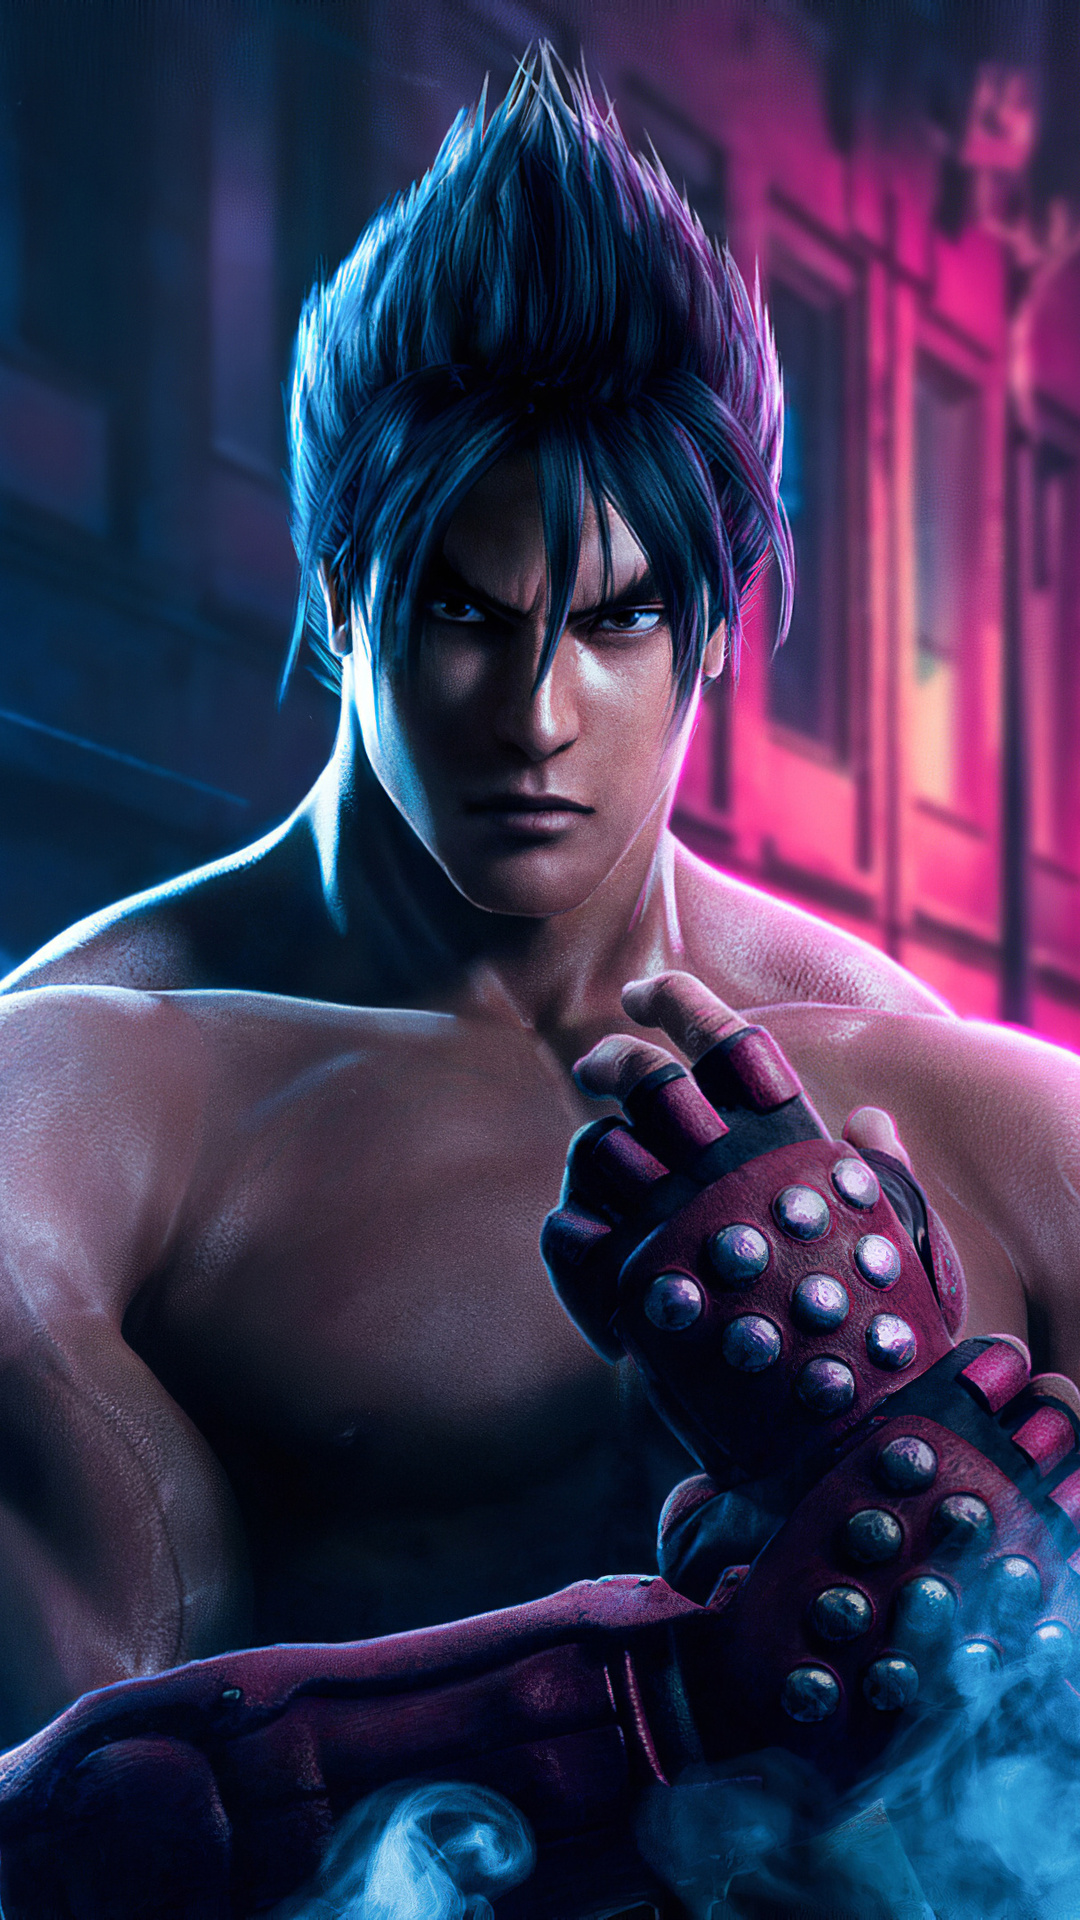 Tekken 3 Game Wallpaper Download 4k Game Wallpaper